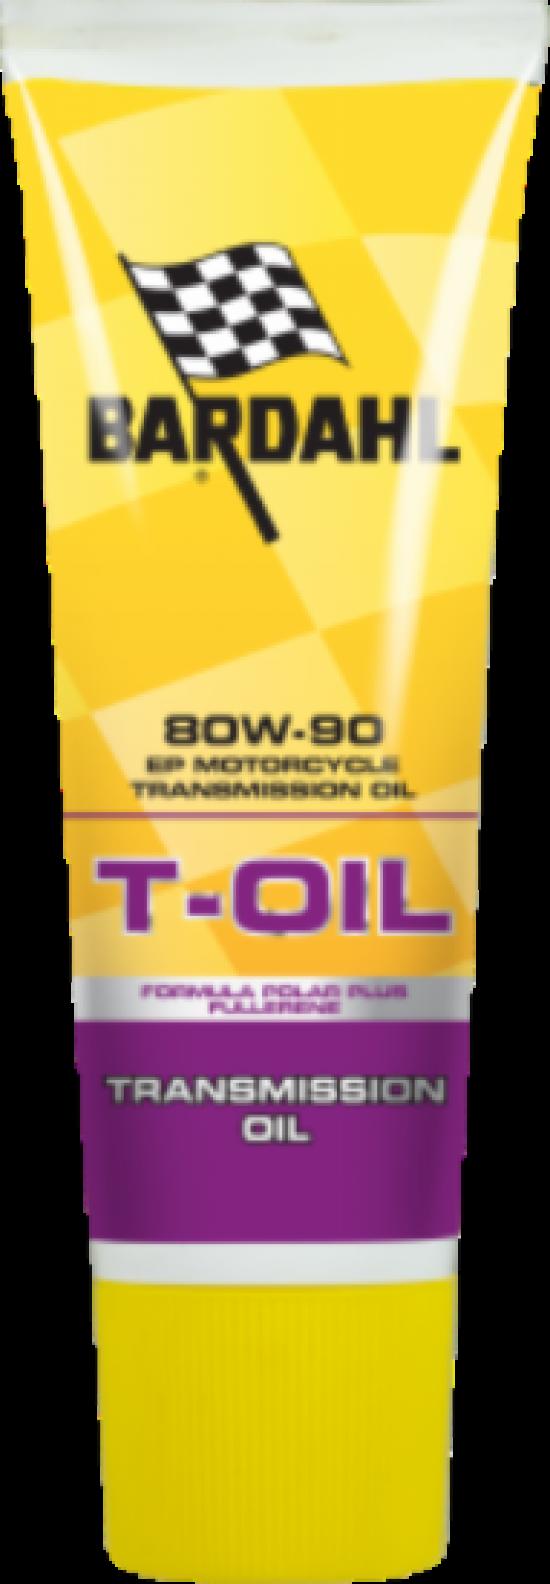 TRANSMISSION OIL